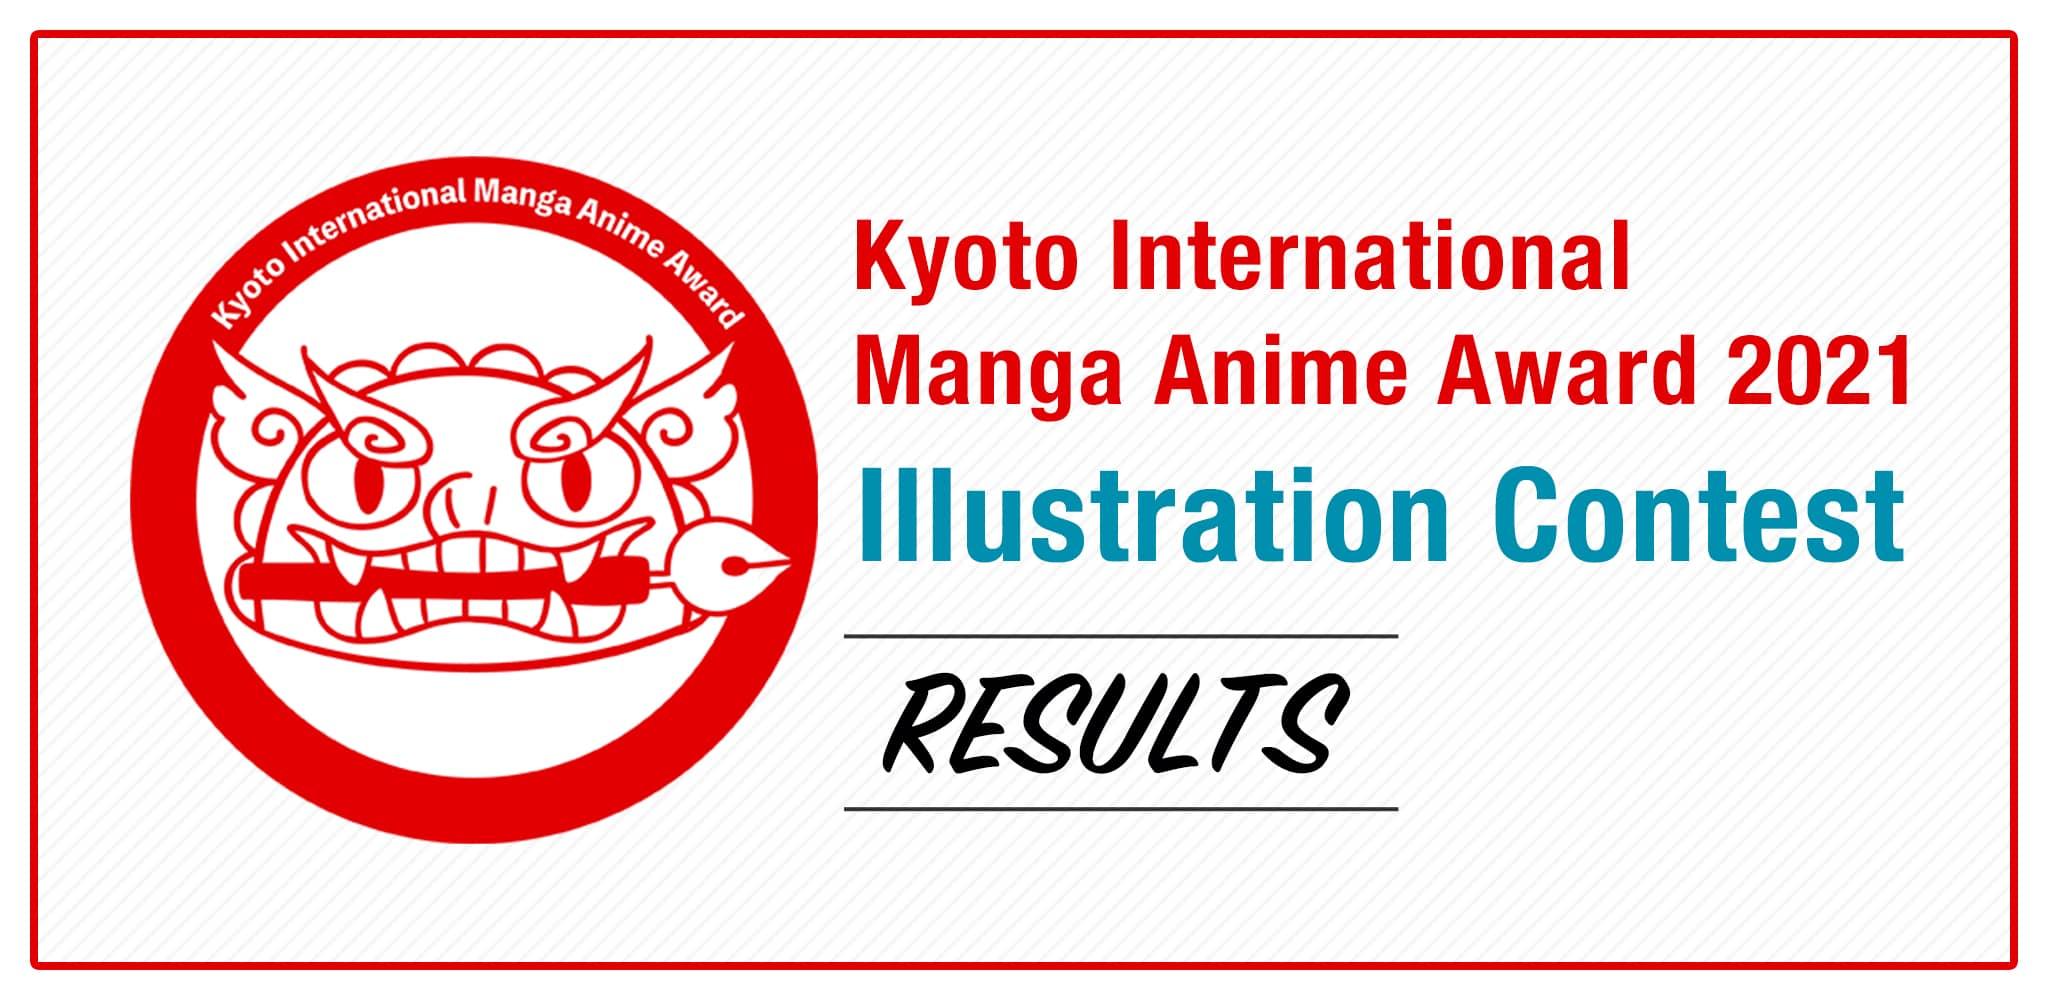 Kyoto International Manga Anime Award 2021 Illustration Contest  Contest - ART street by MediBang